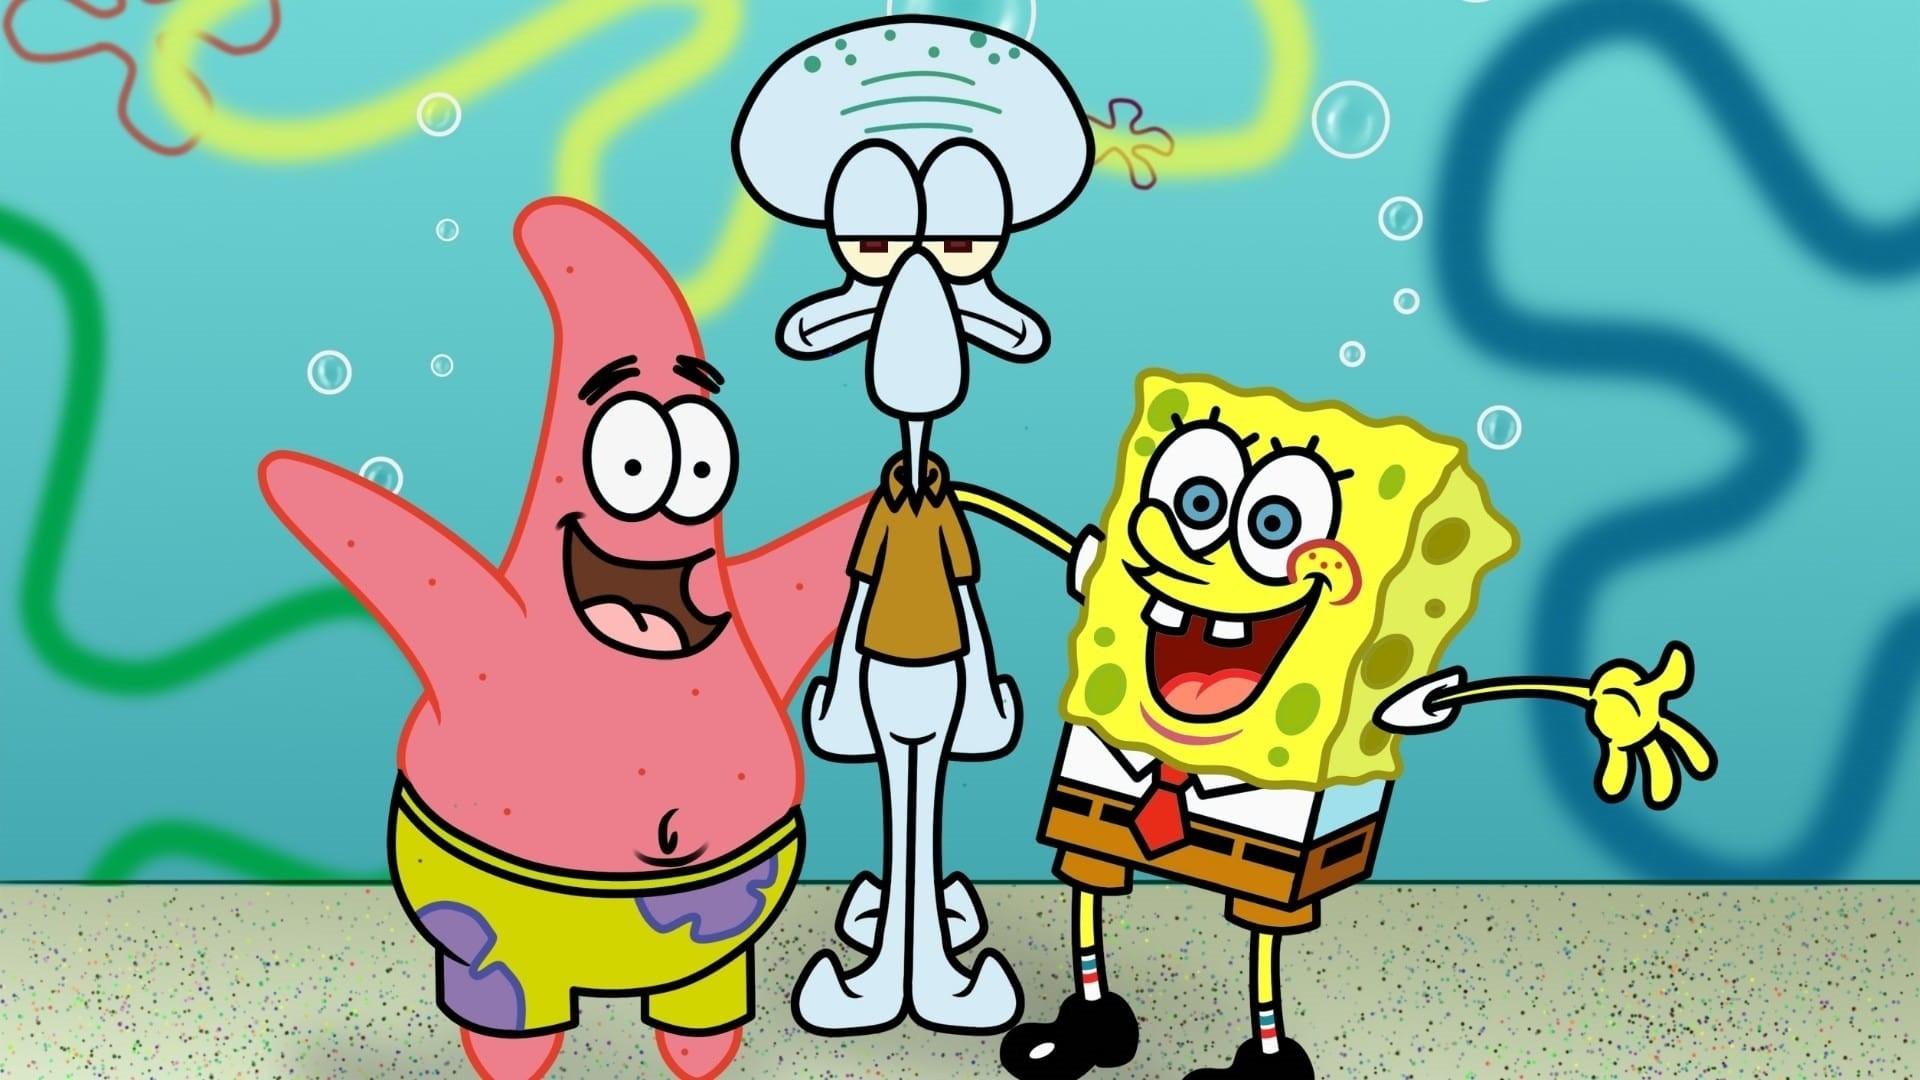 Spongebob And Patrick Wallpaper For Pc